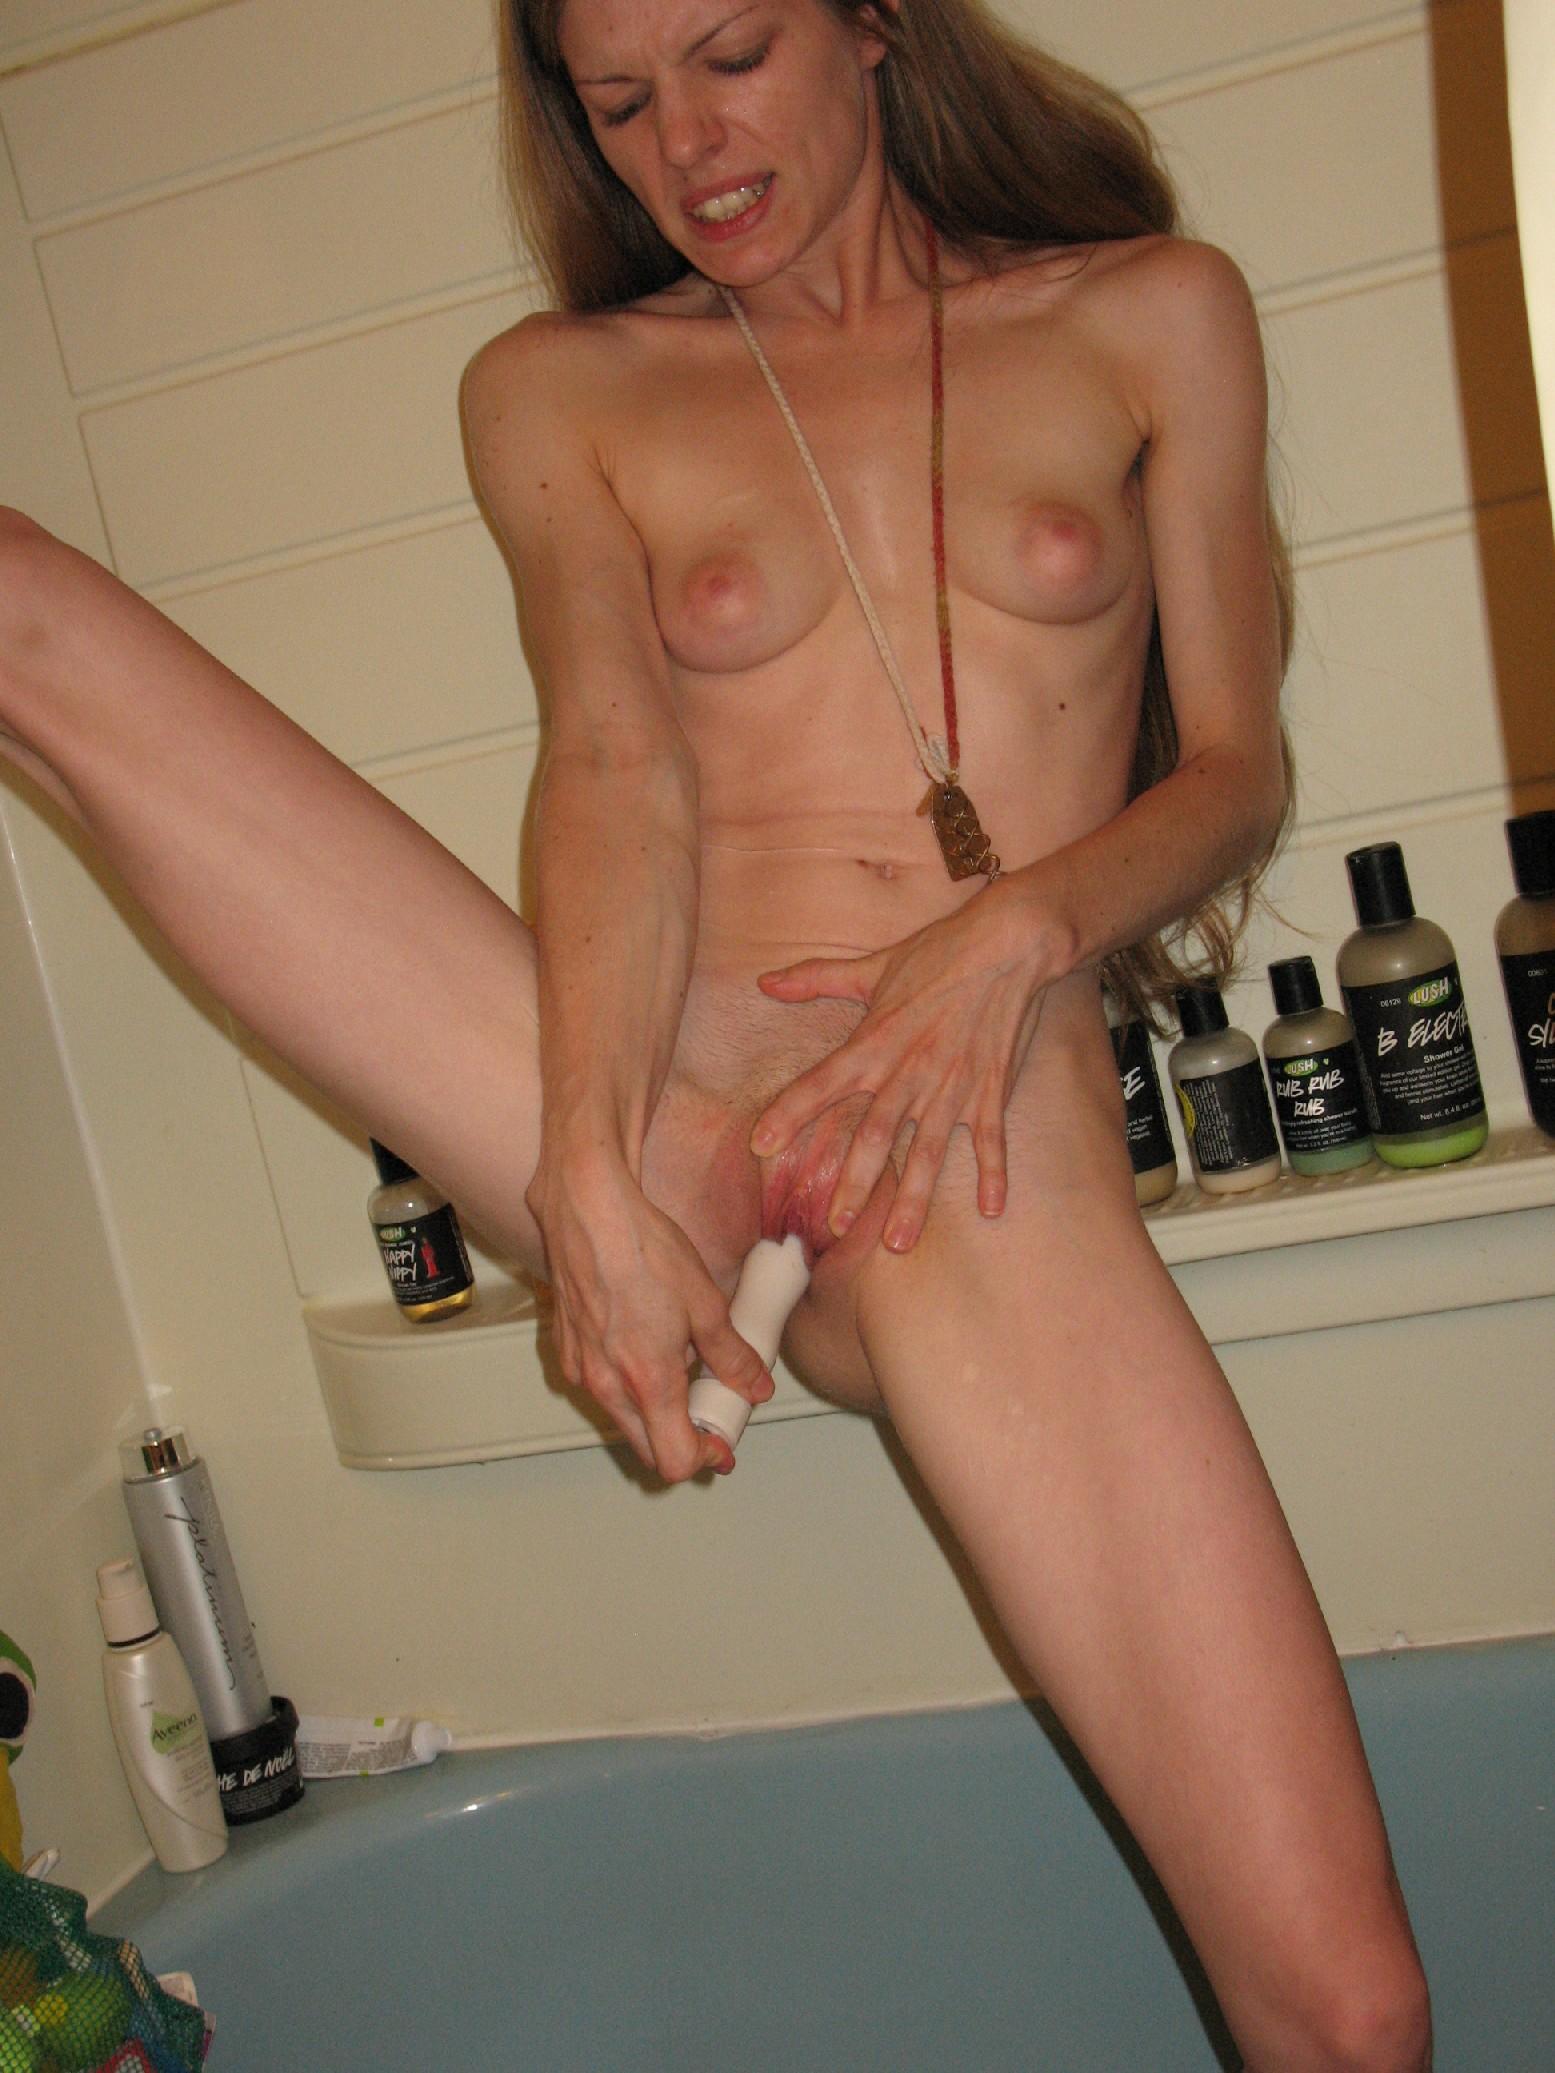 Ameture female masterbation